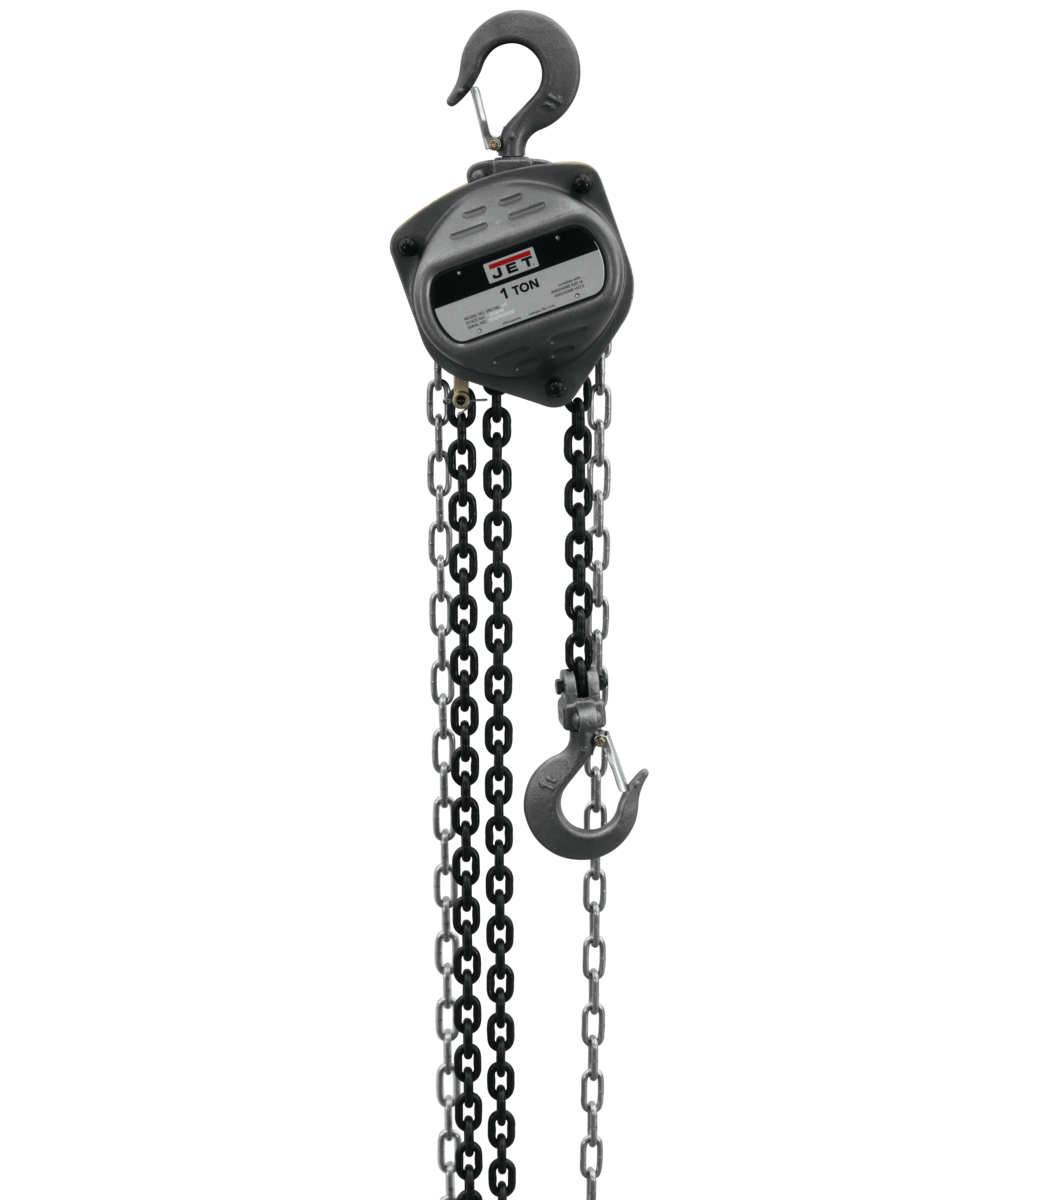 S90-100-15, 1-Ton Hand Chain Hoist With 15' Lift